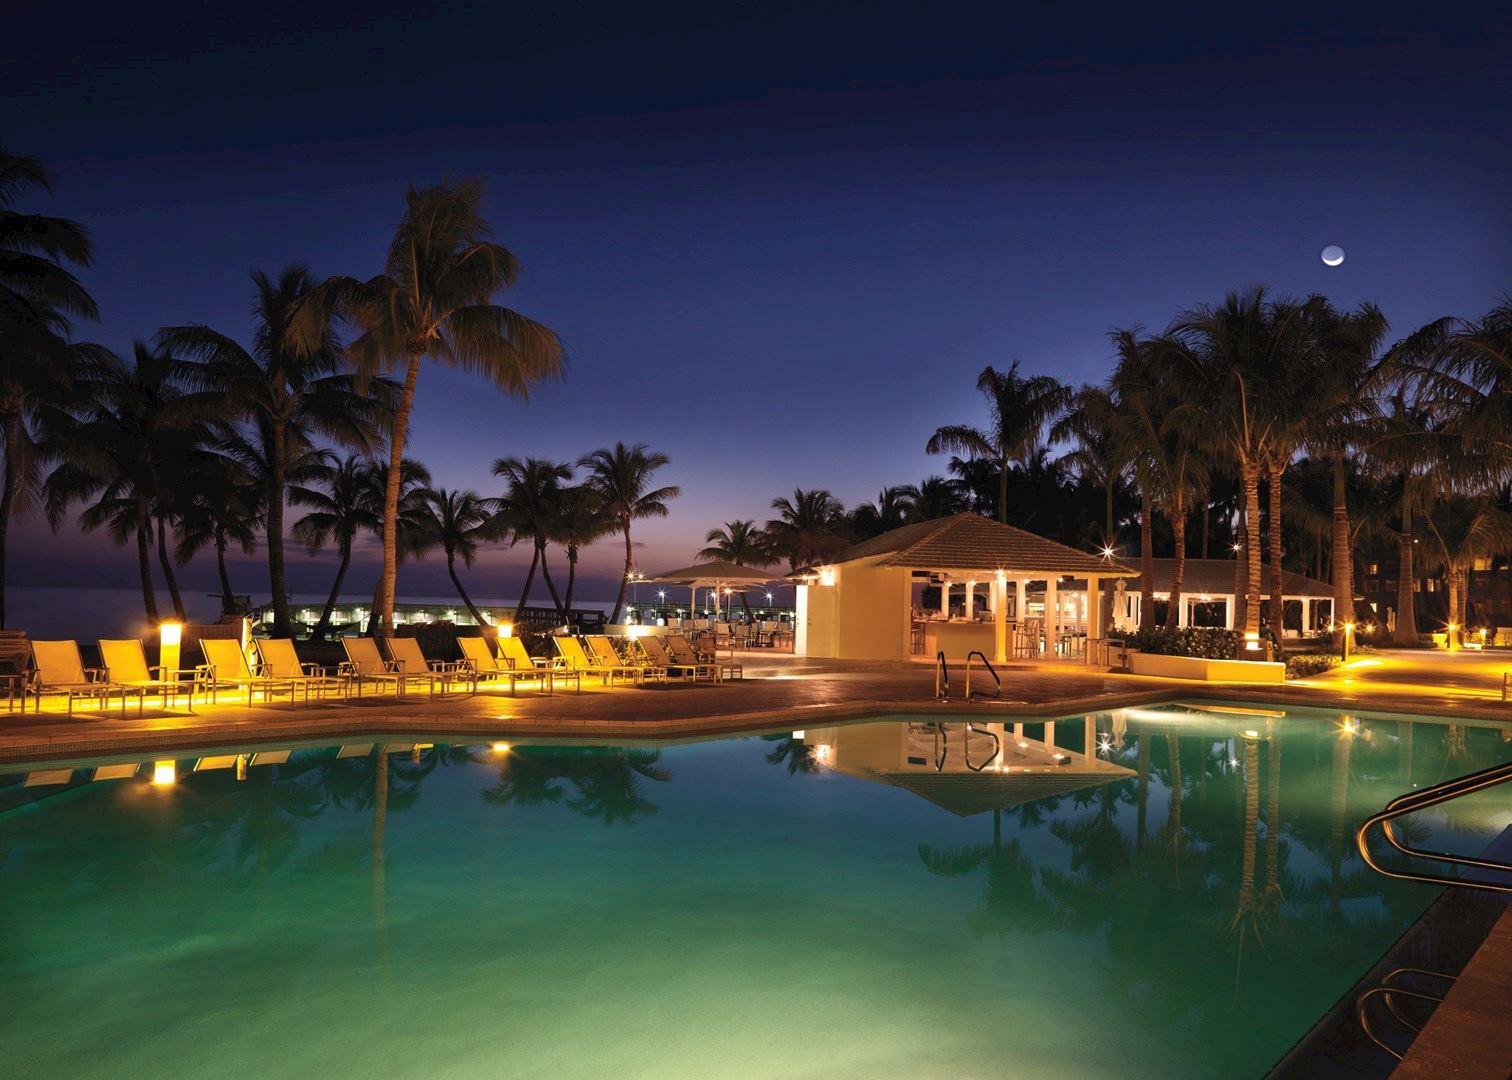 Casa Marina Resort Usa Hotels Audley Travel